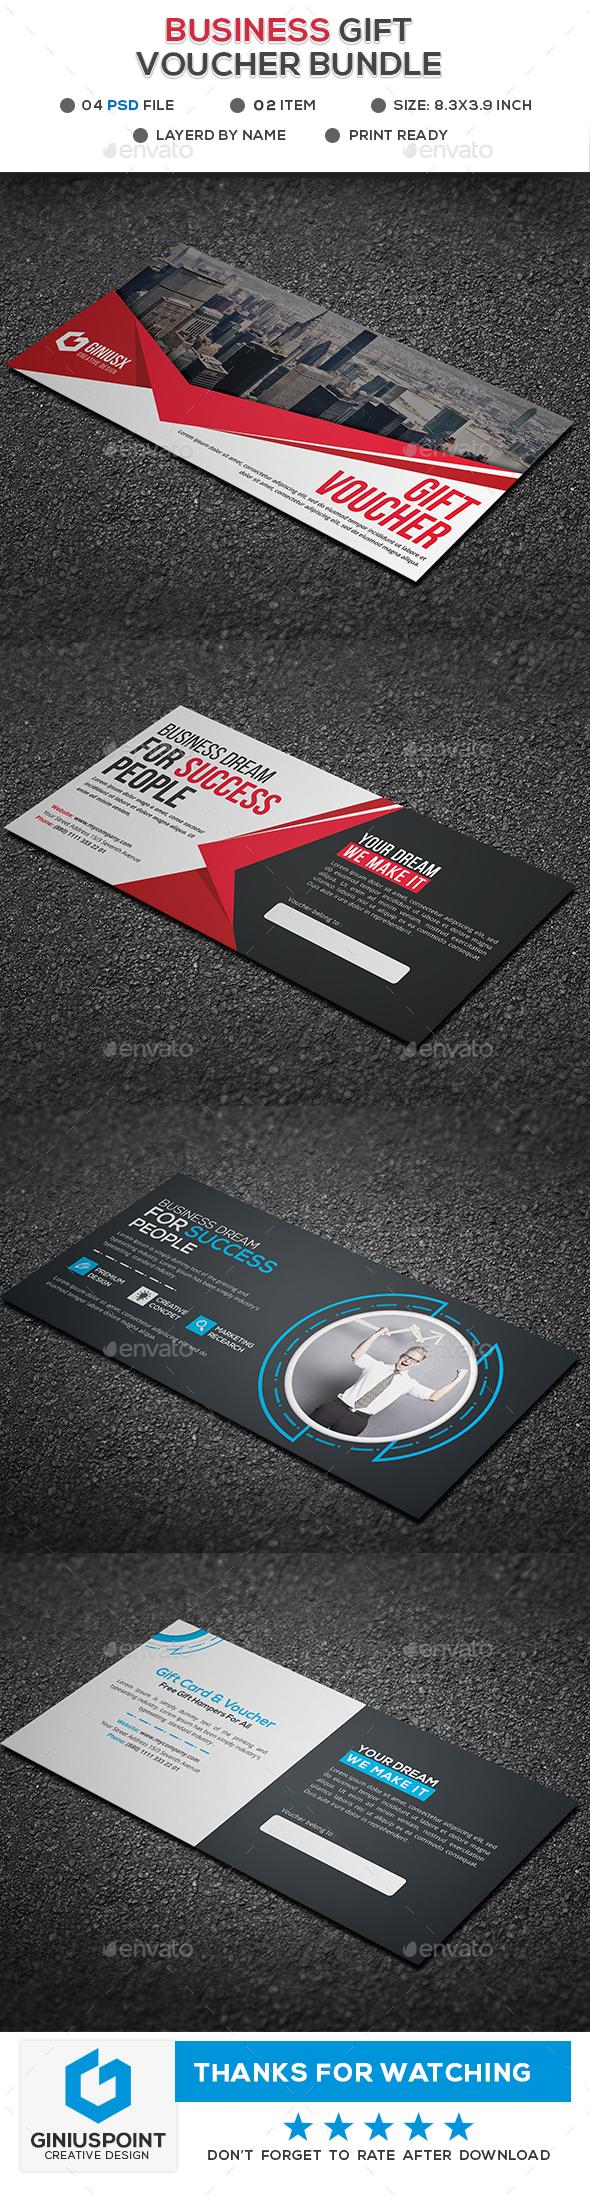 Business Gift Voucher Bundle - Cards & Invites Print Templates